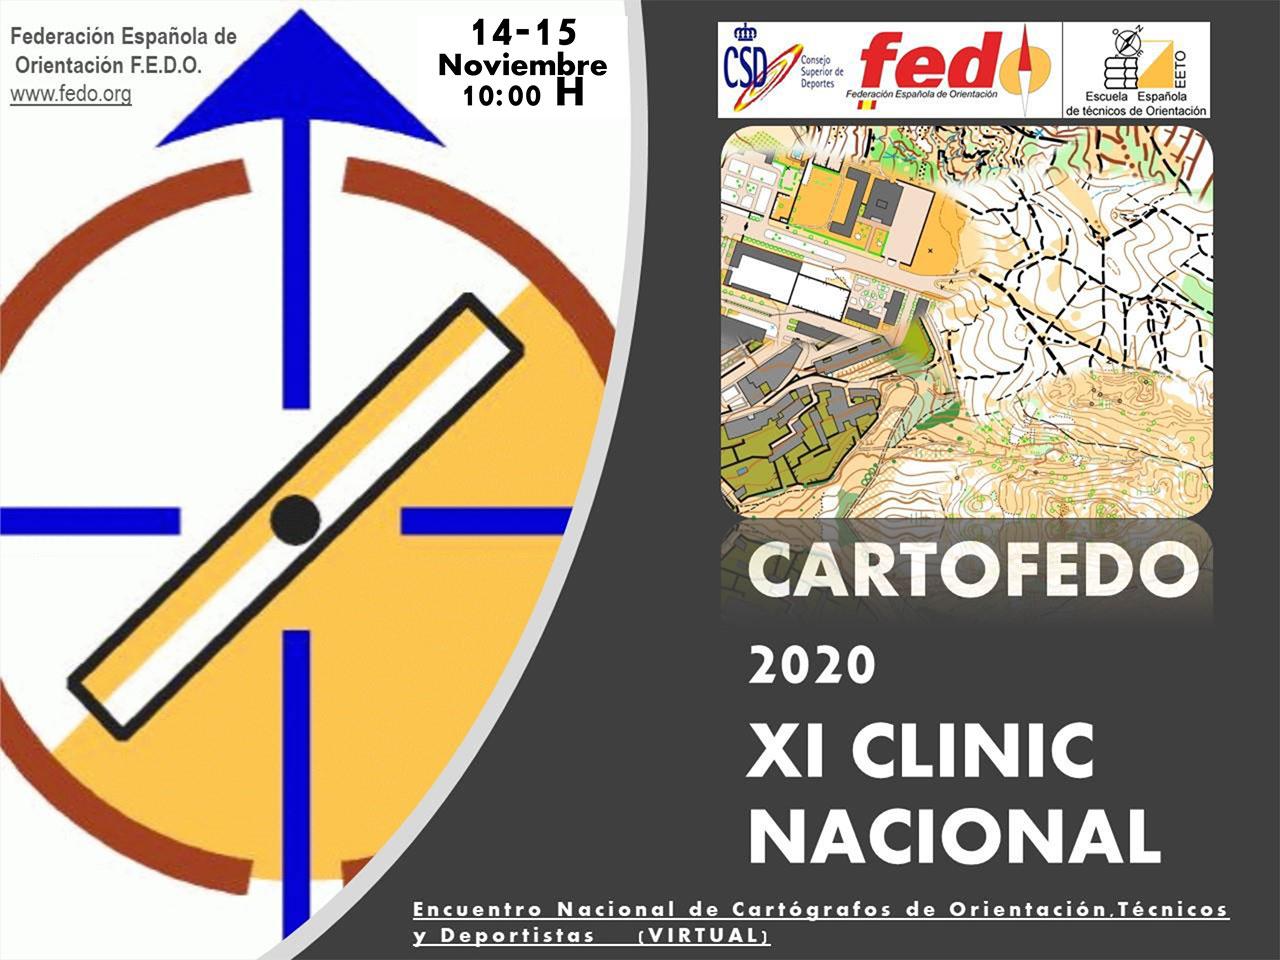 CARTOFEDO 2020